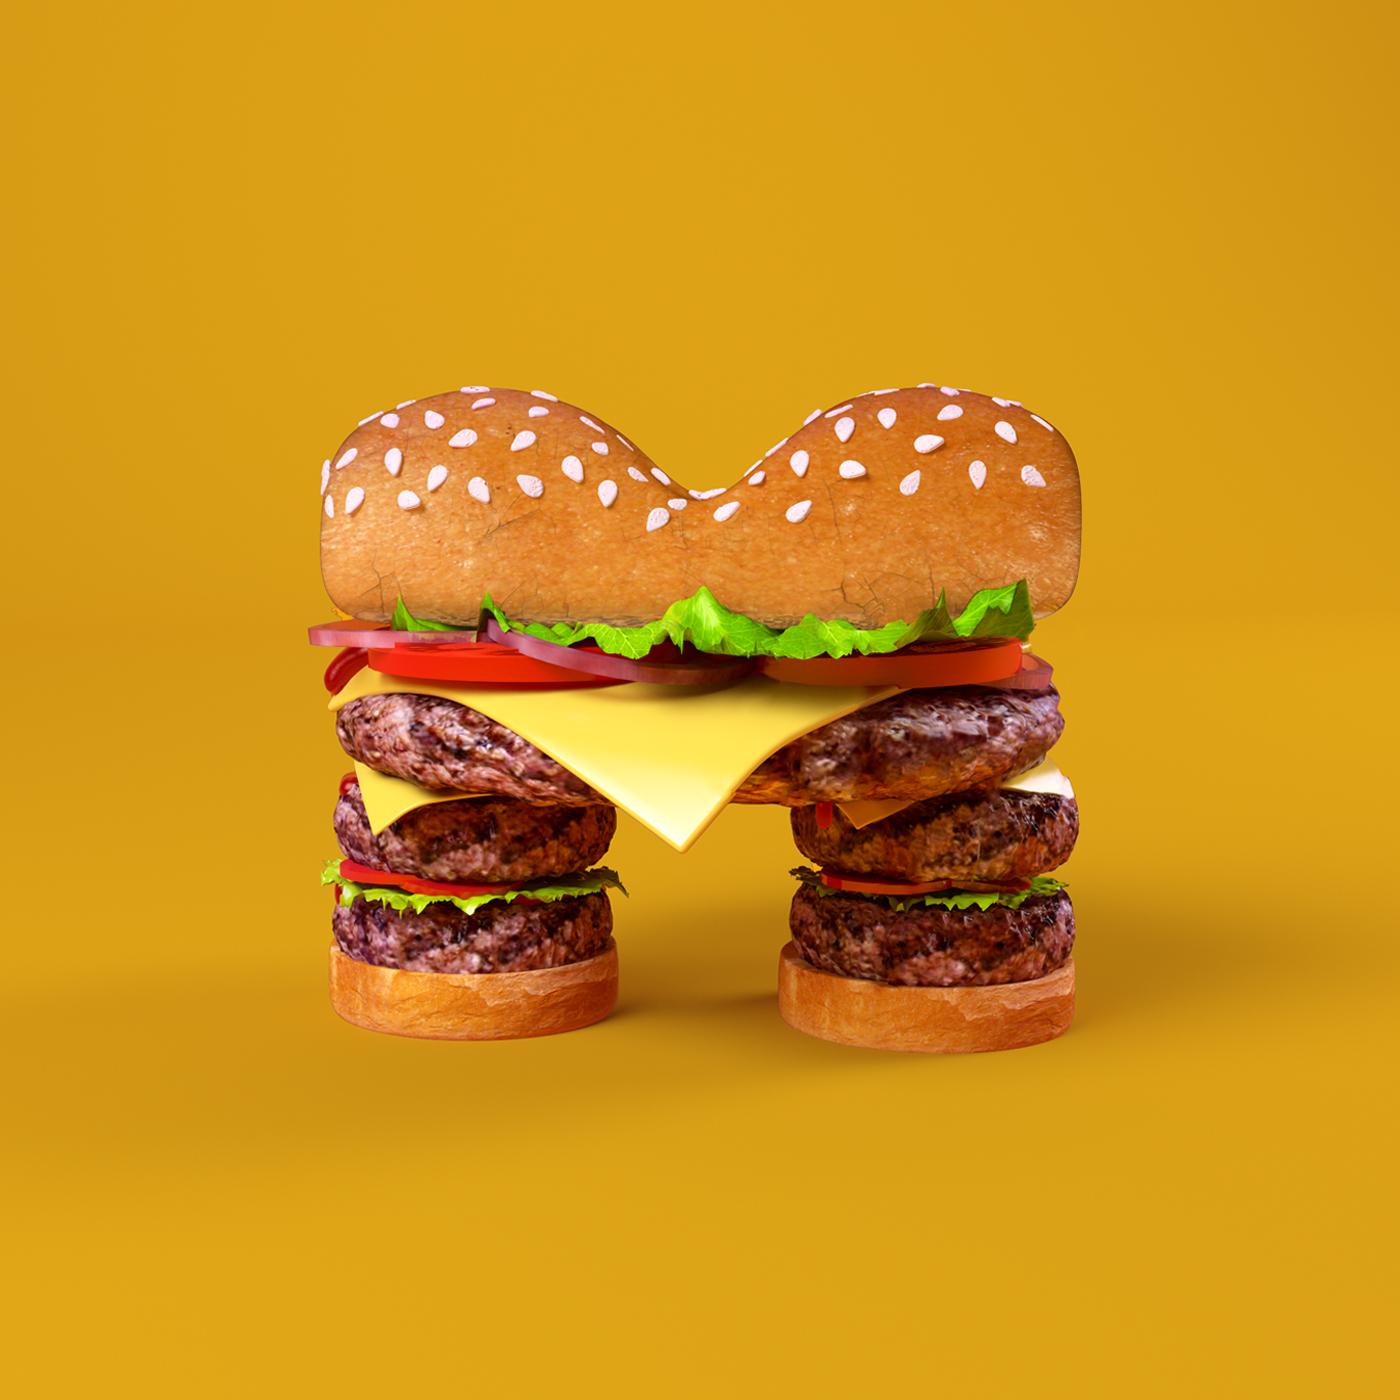 FOOD 3DFOOD FOODALPHABET CESS 3D 3DTYPE LETTERING CGI 3DARTIST BURGER